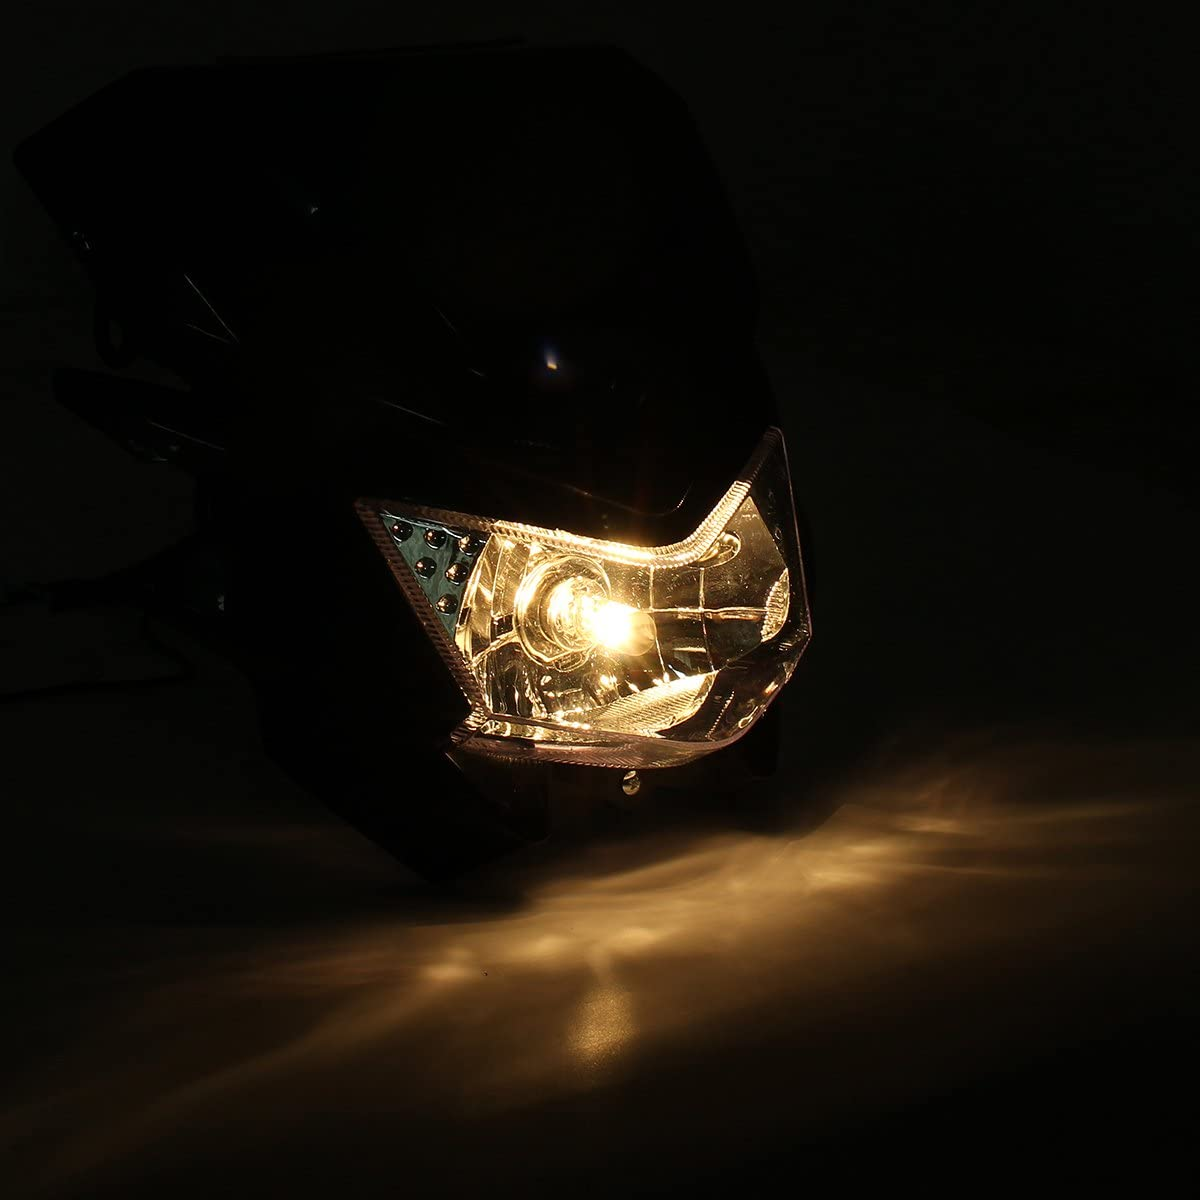 Blanc Alamor 12V H4 Lampe De T/ête Universelle Moto pour Yamaha Dual Sport Street Fighter Dirtbike